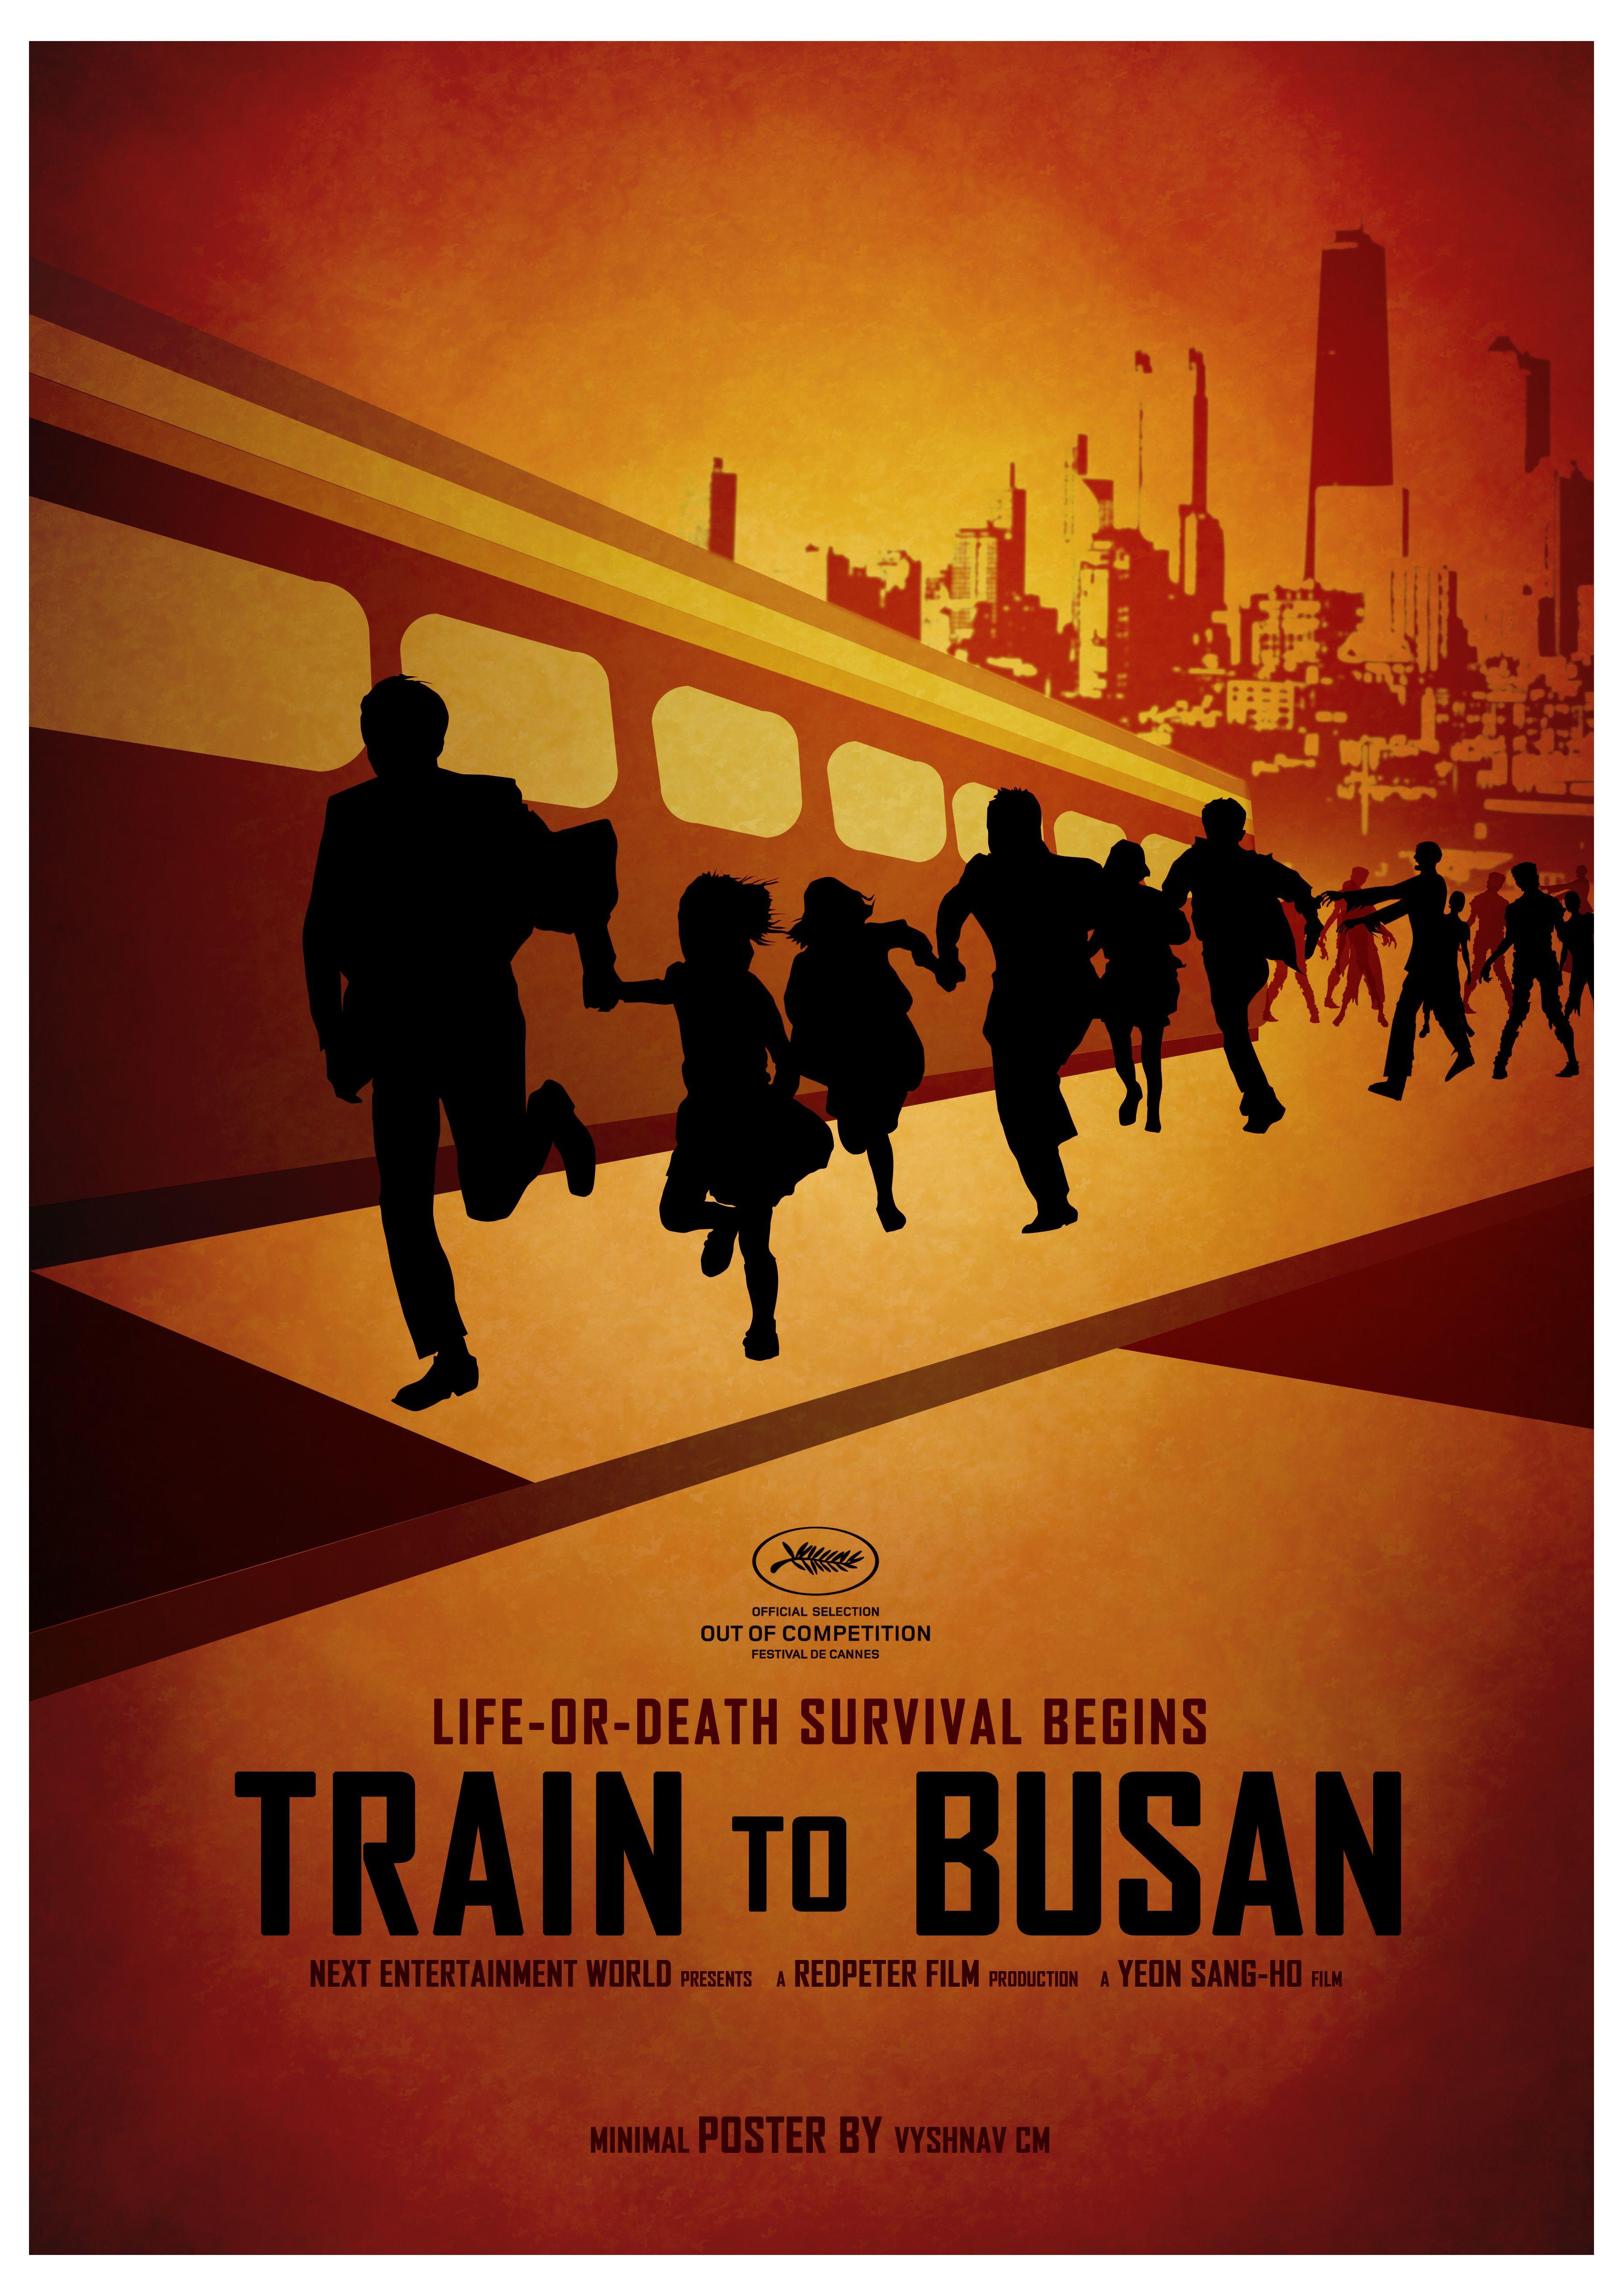 Train To Busan Minimal Poster Design Designed By Vyshnav Cm